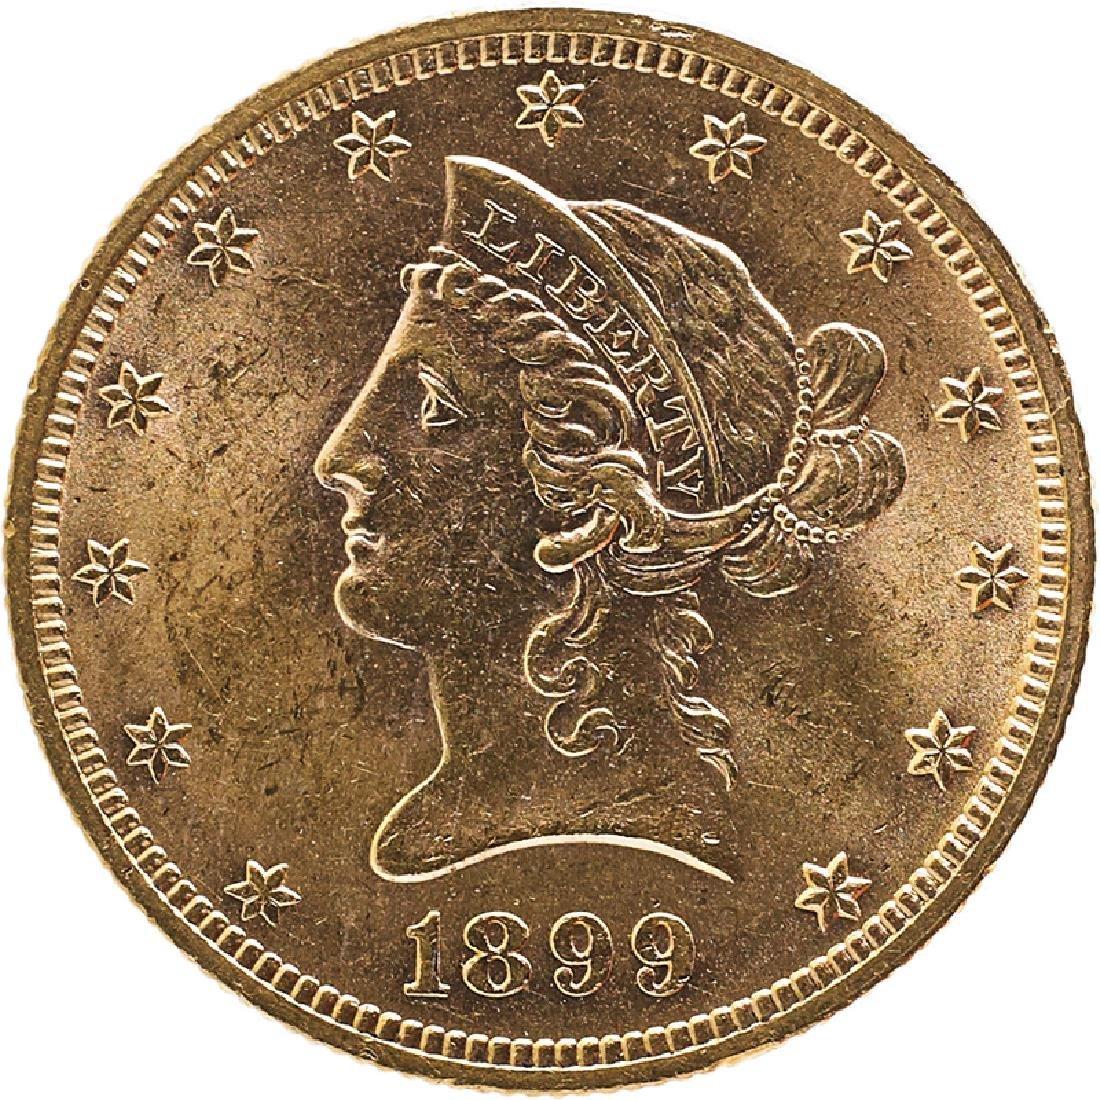 U.S. 1899 LIBERTY $10 GOLD COIN